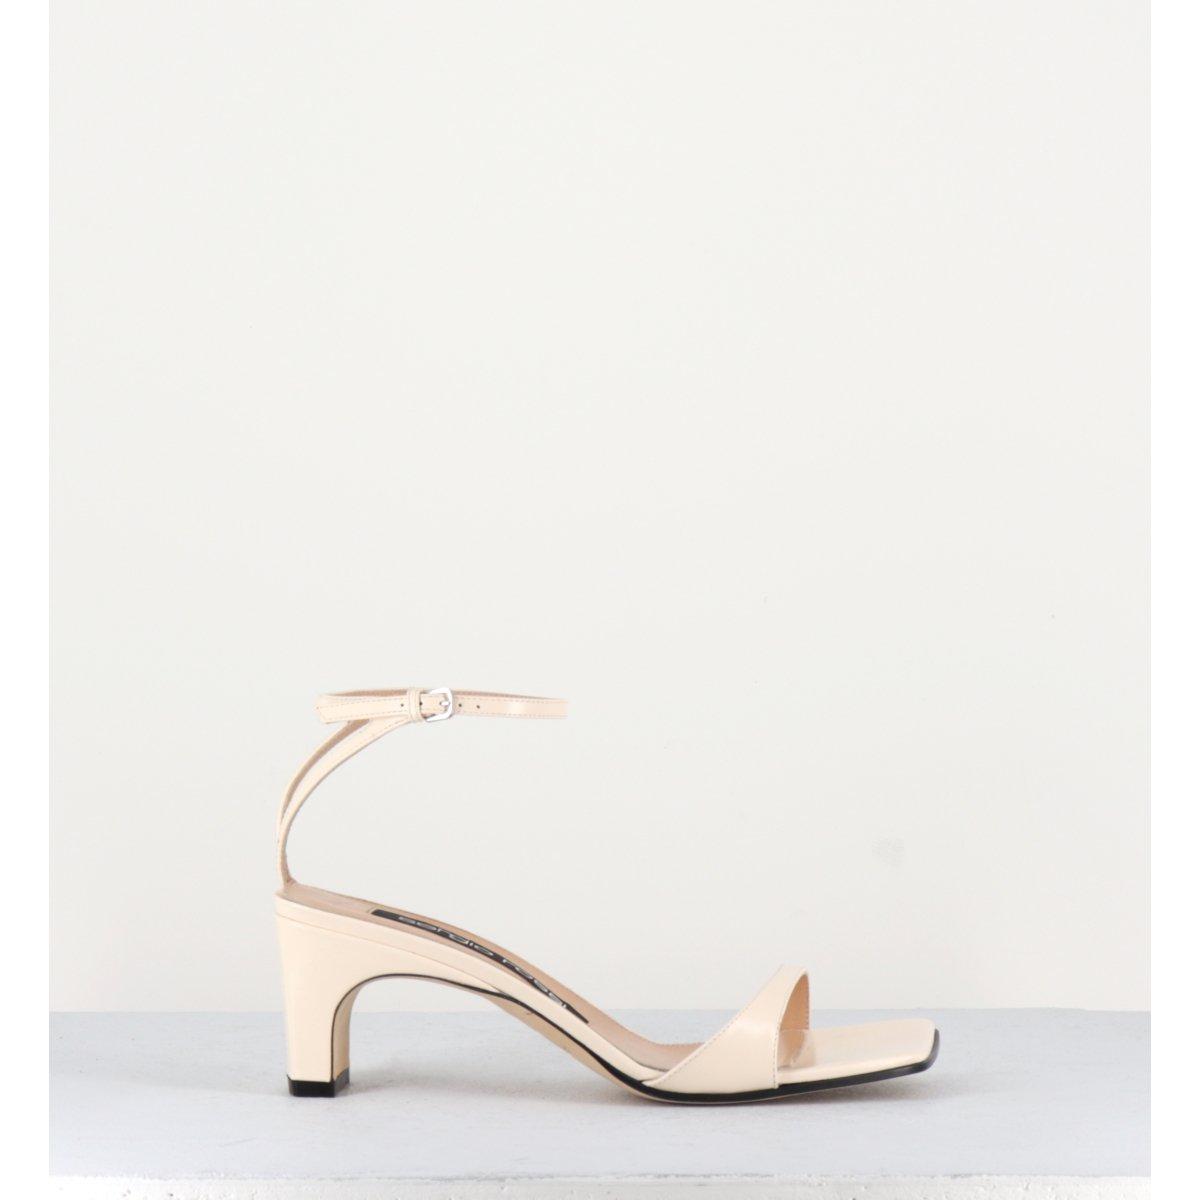 Sandales à talon en cuir glacé blanc Sergio Rossi - A77970B